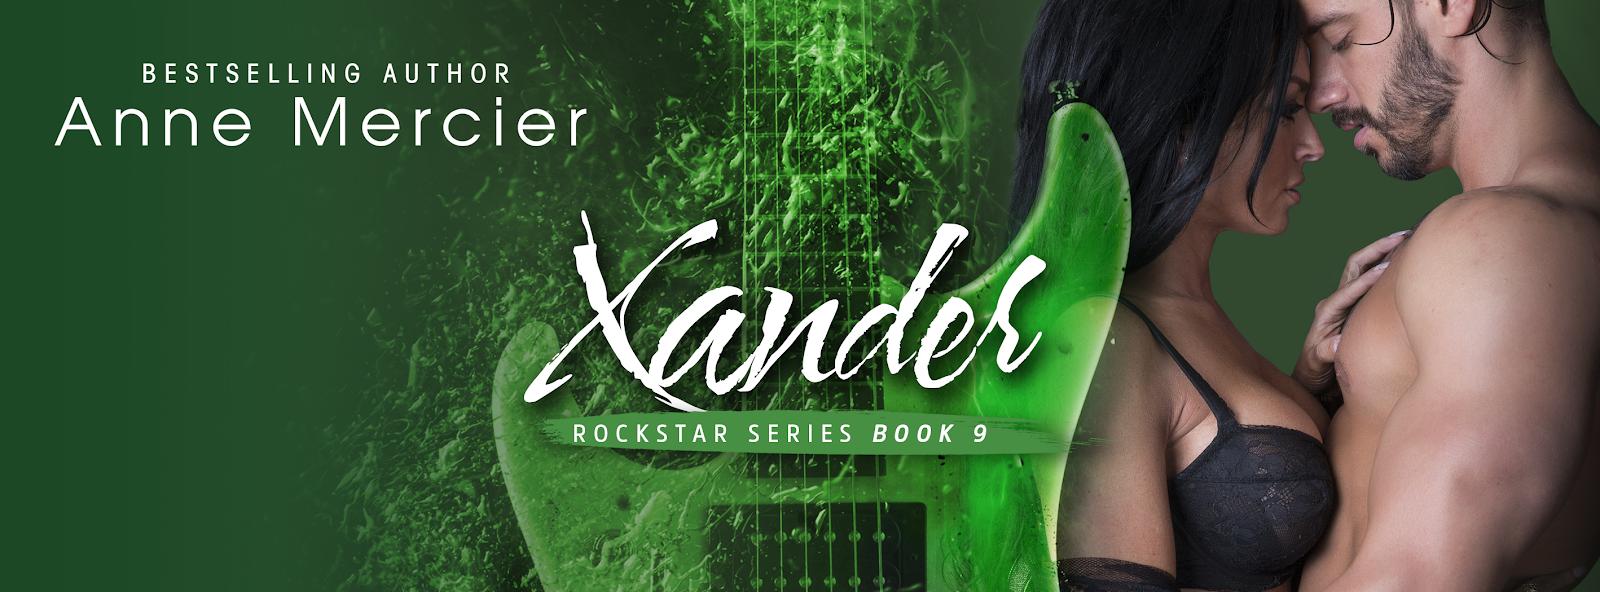 xander banner.png